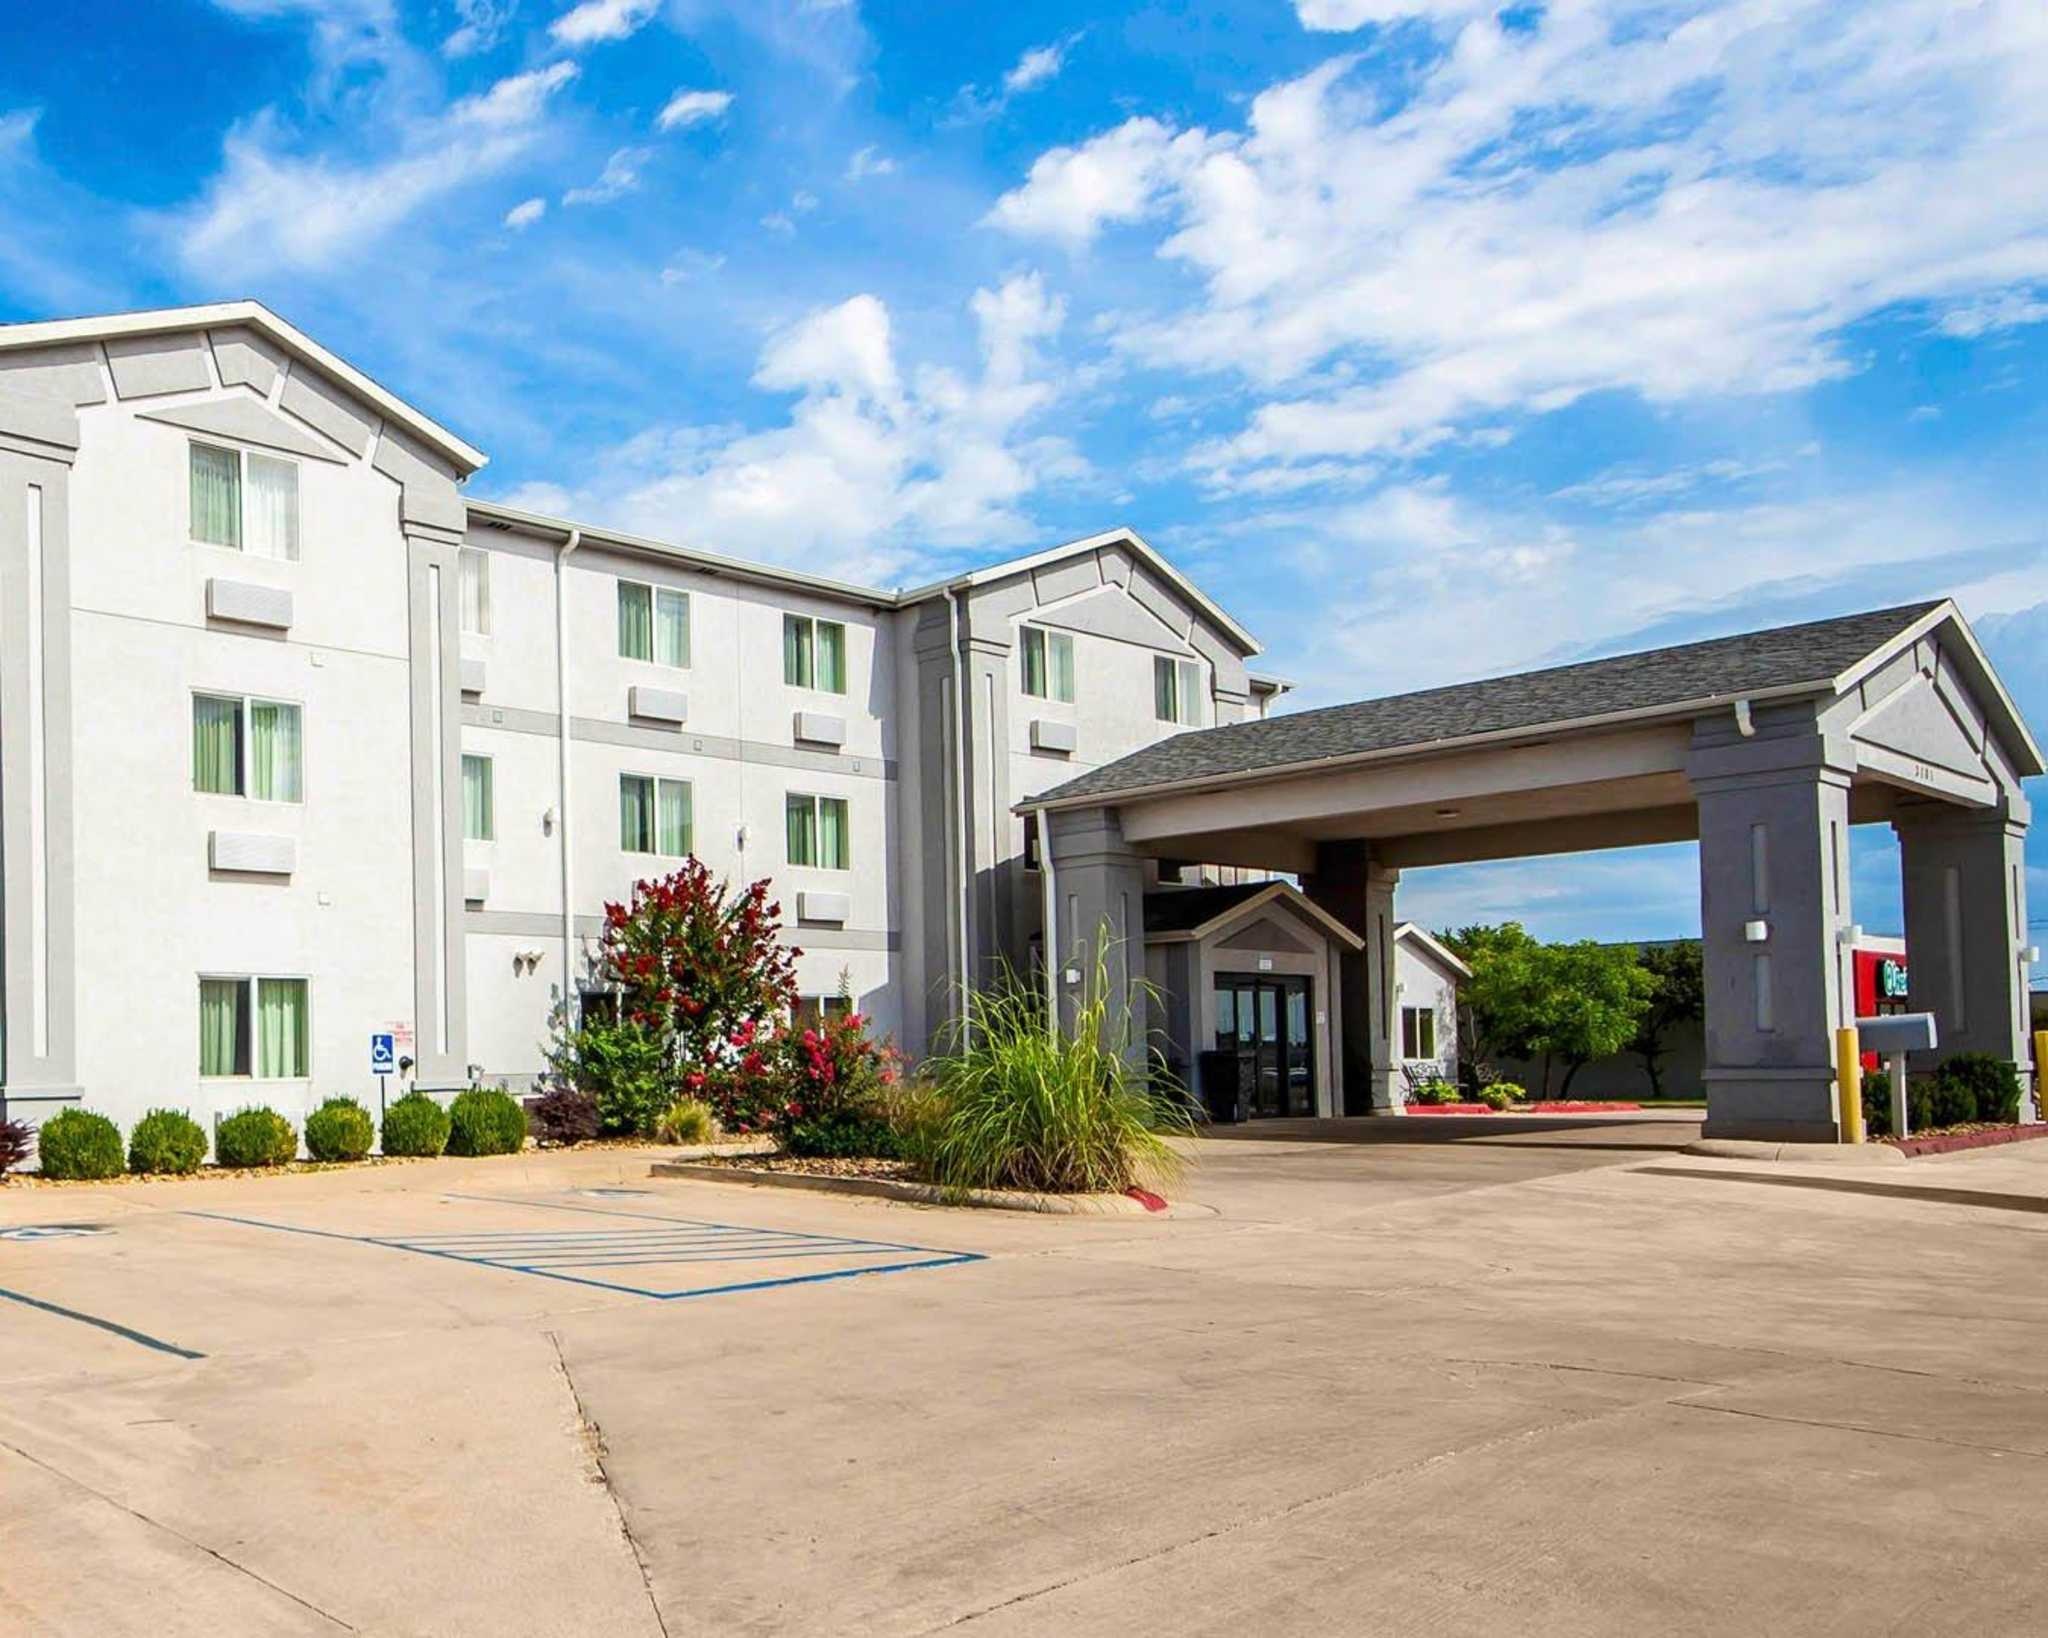 Comfort Inn Amp Suites Coupons Ponca City Ok Near Me 8coupons